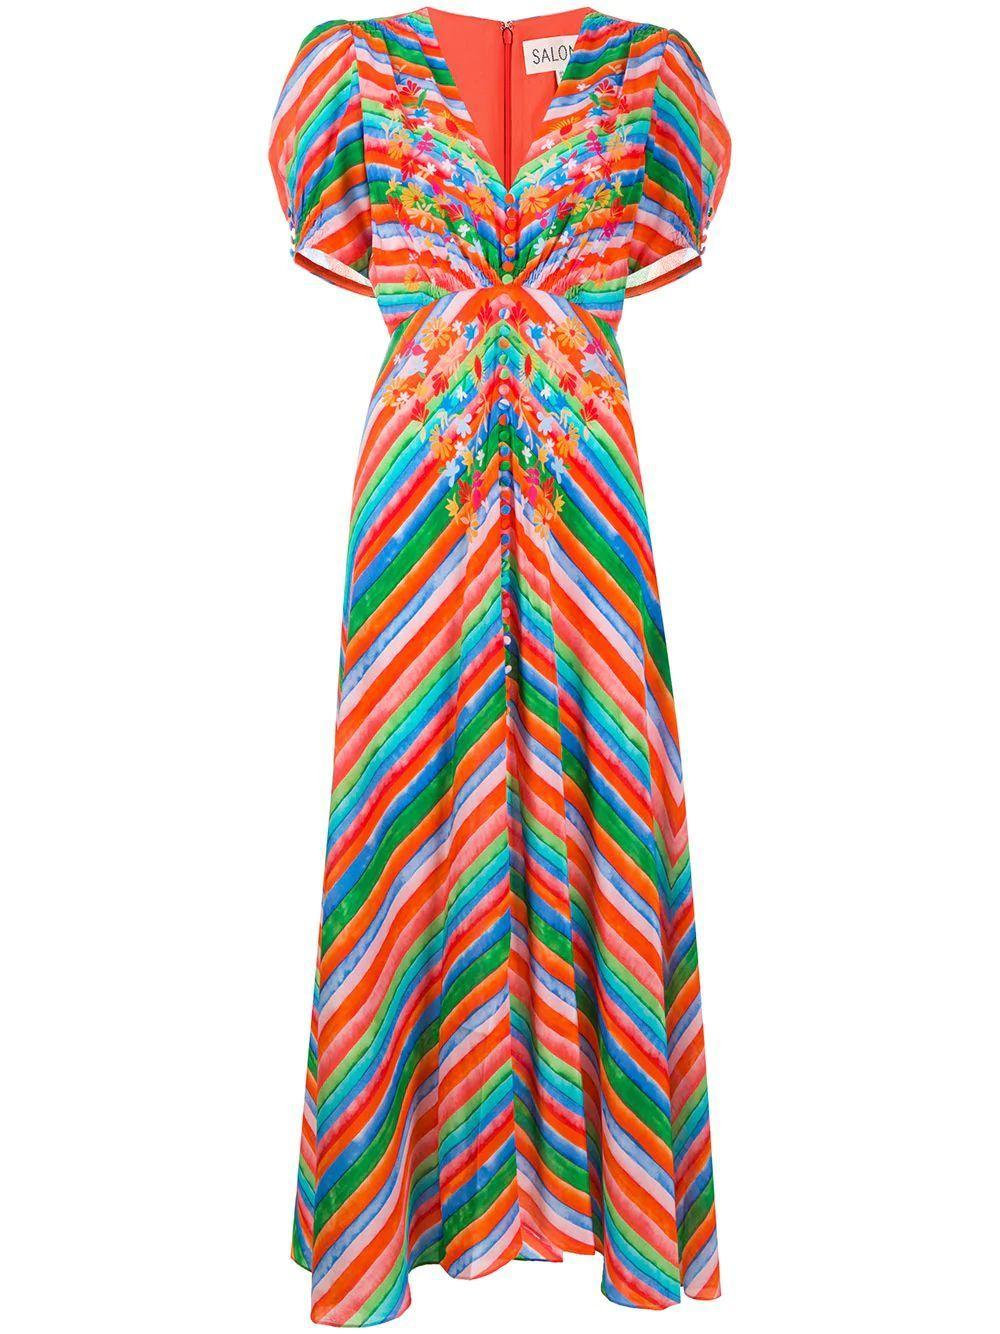 Lea Long Watercolor Striped Dress Item # 1464